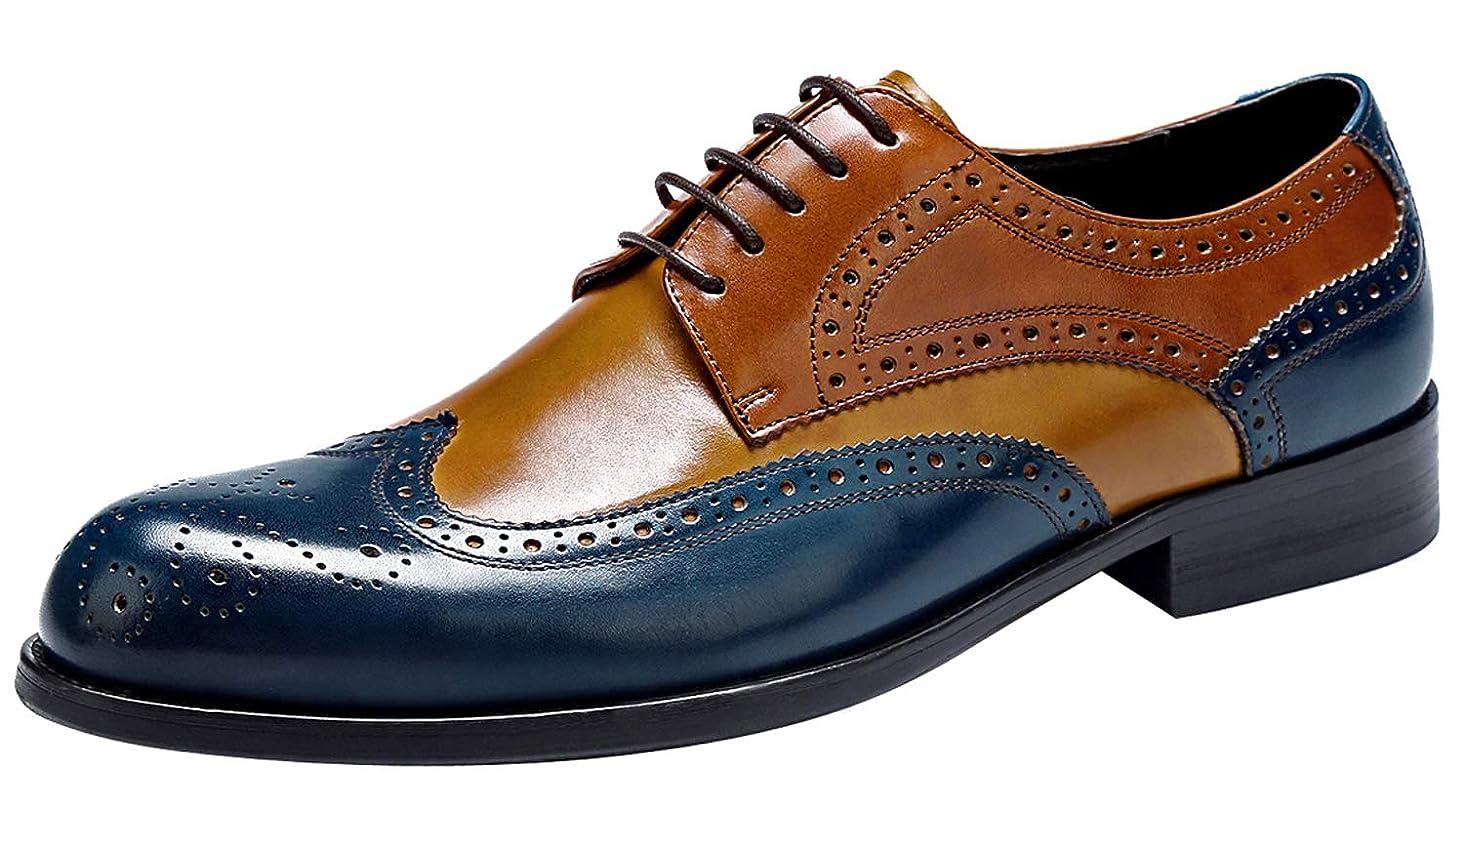 Mens Wingtip Oxford Shoes for Men - Mens Genuine Leather Dress Shoes, Brogue Formal Shoes, Lace-up Derbies Shoes